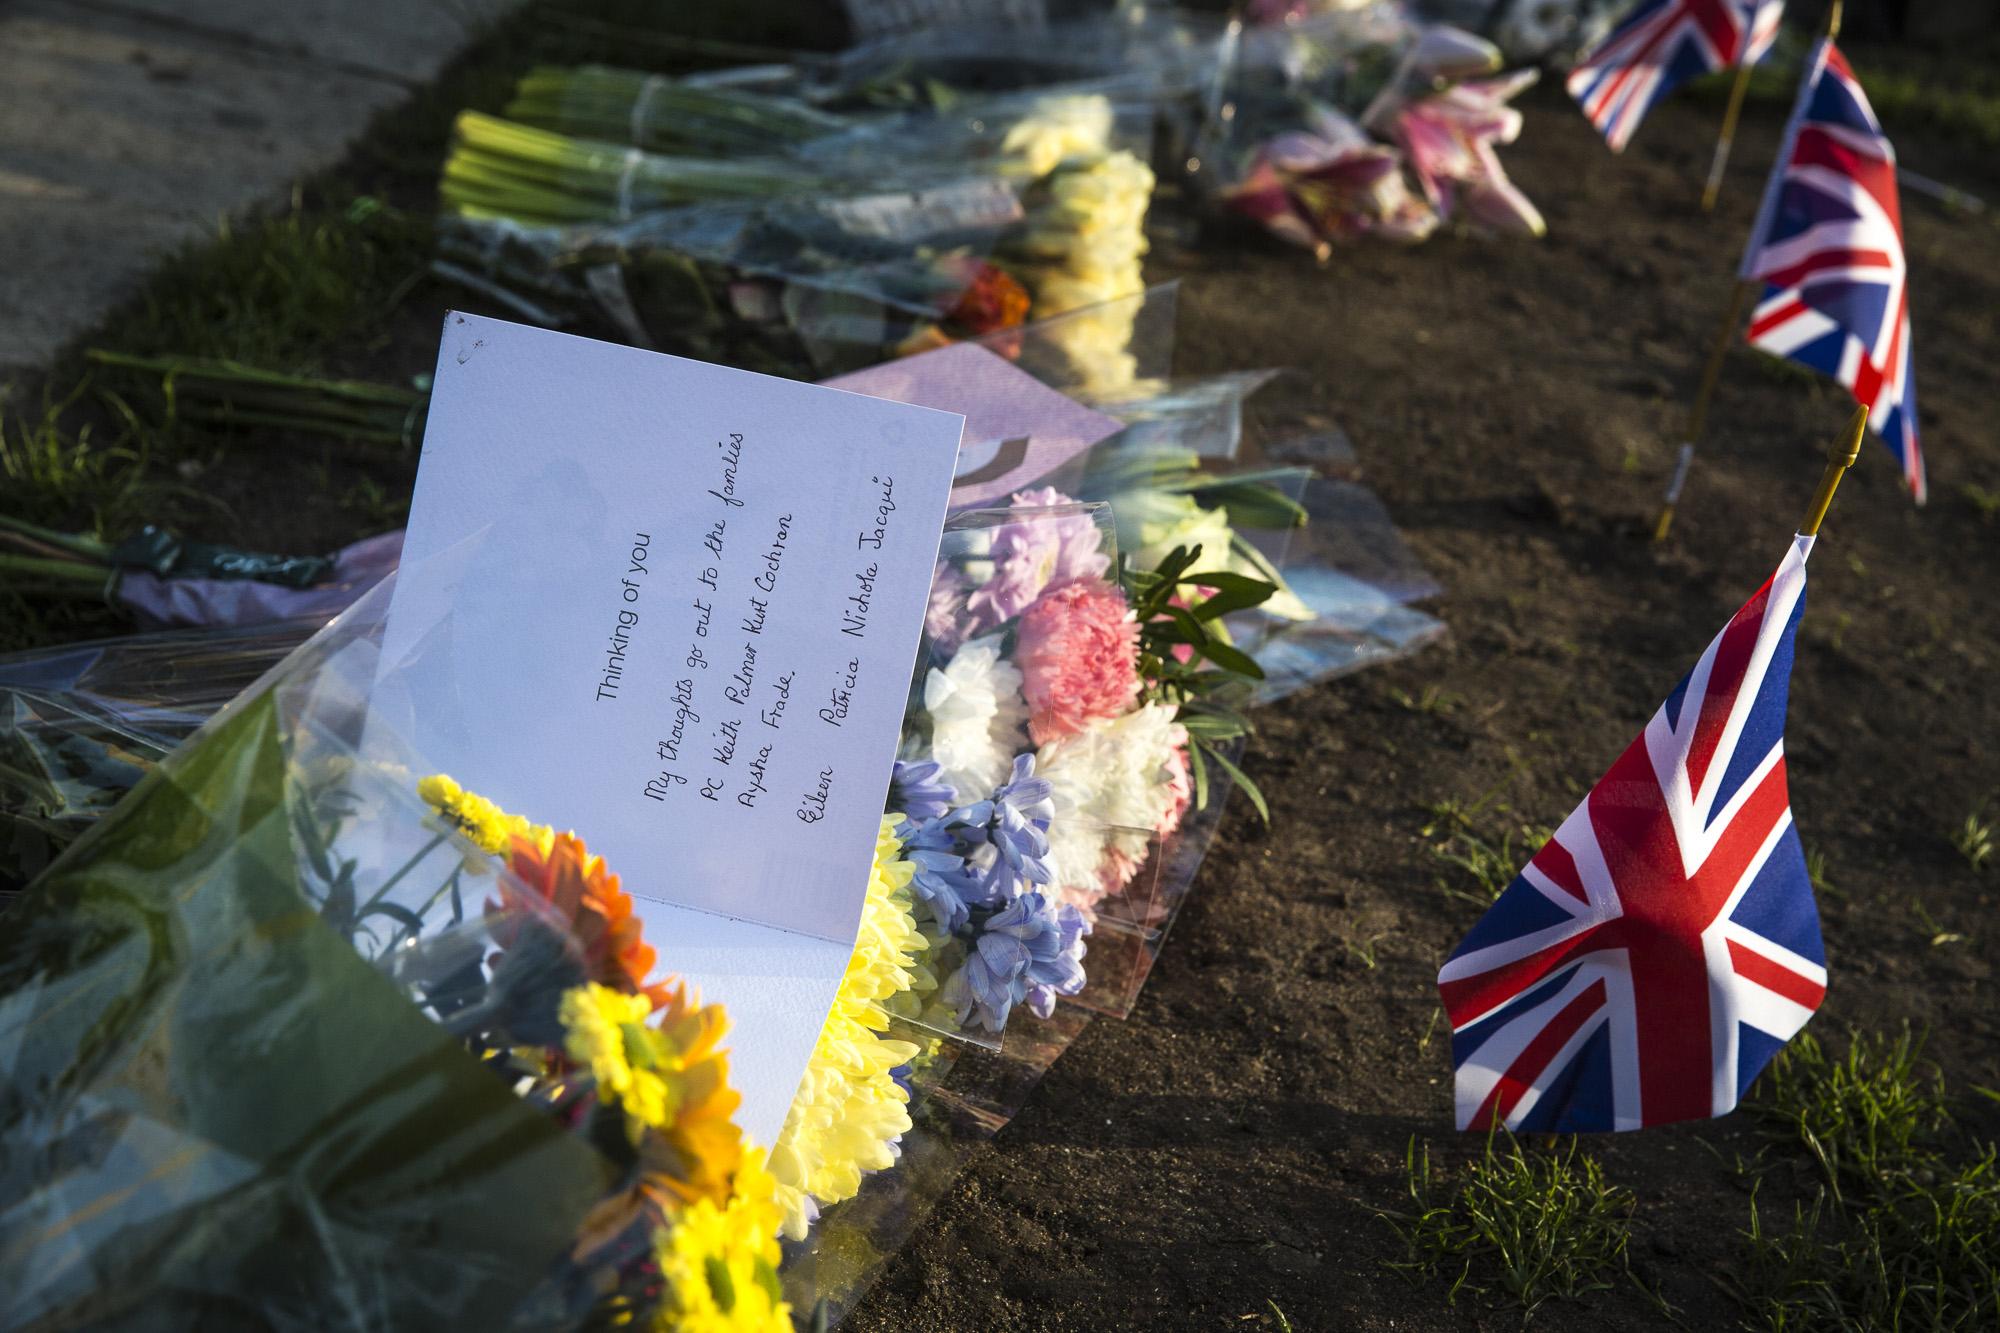 London_Attack_Hope_Not_Hate-53.jpg